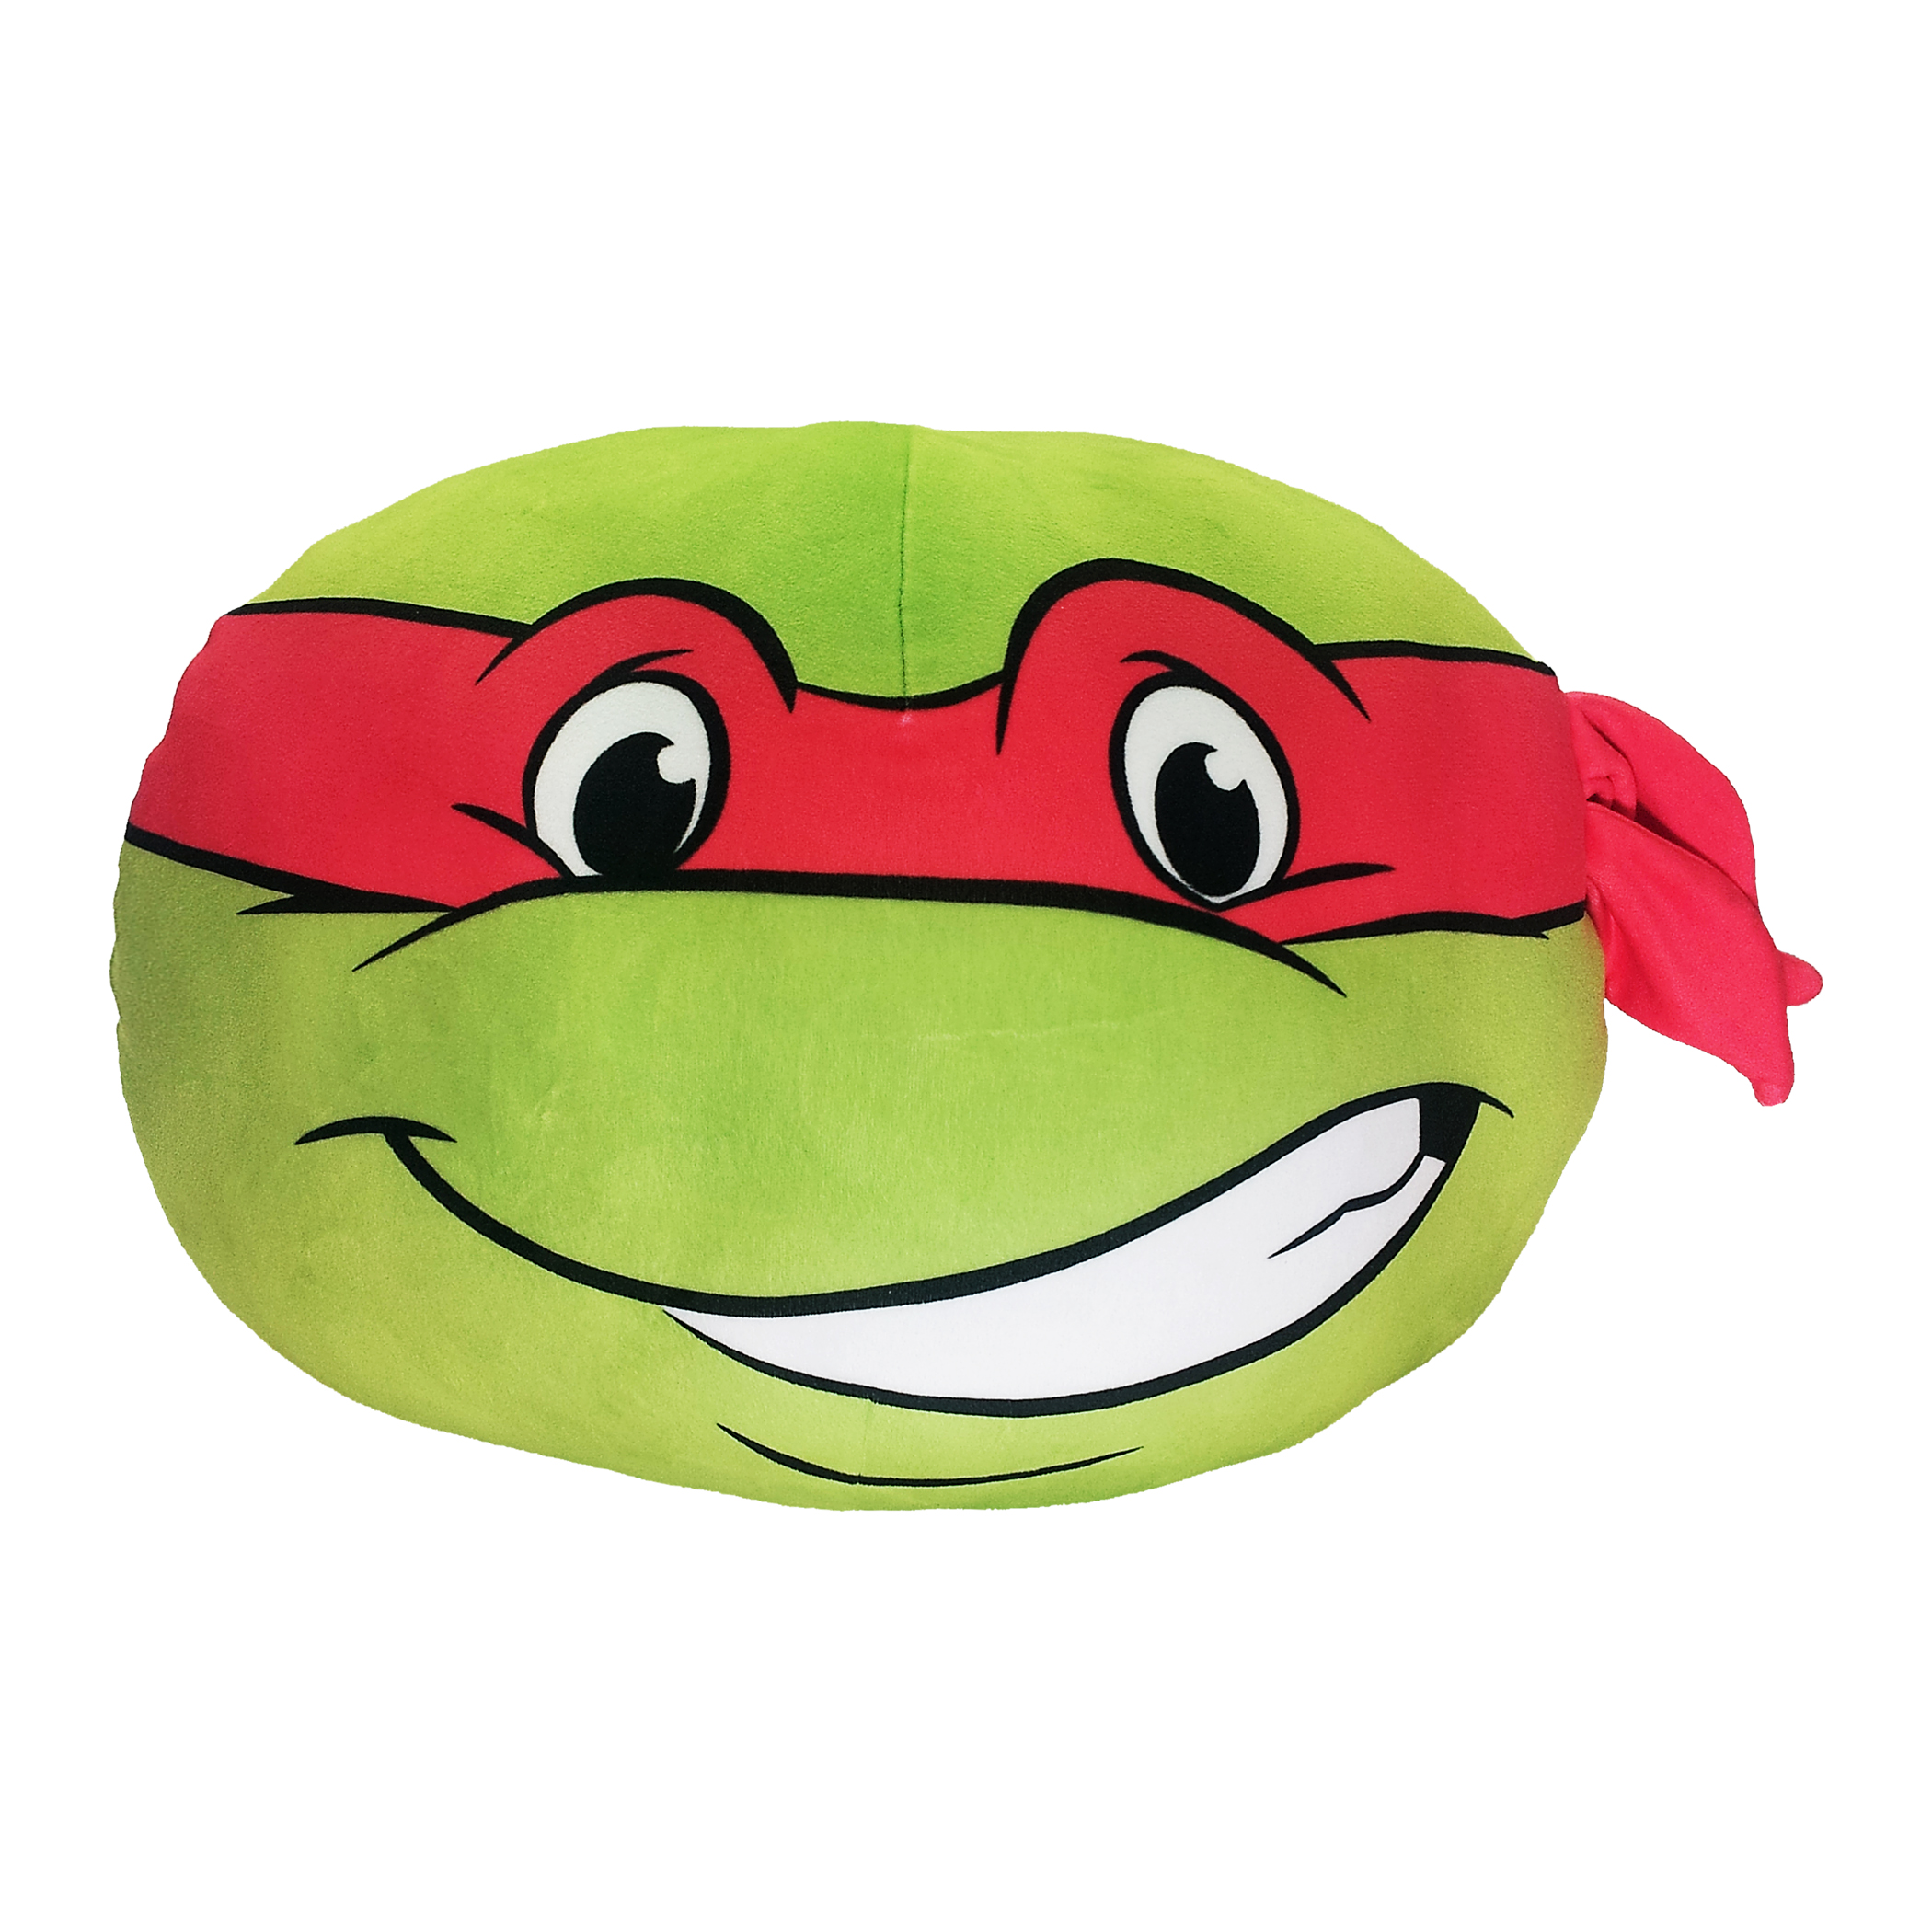 "Teenage Mutant Ninja Turtles, Raph 14"" Cloud Pillow"